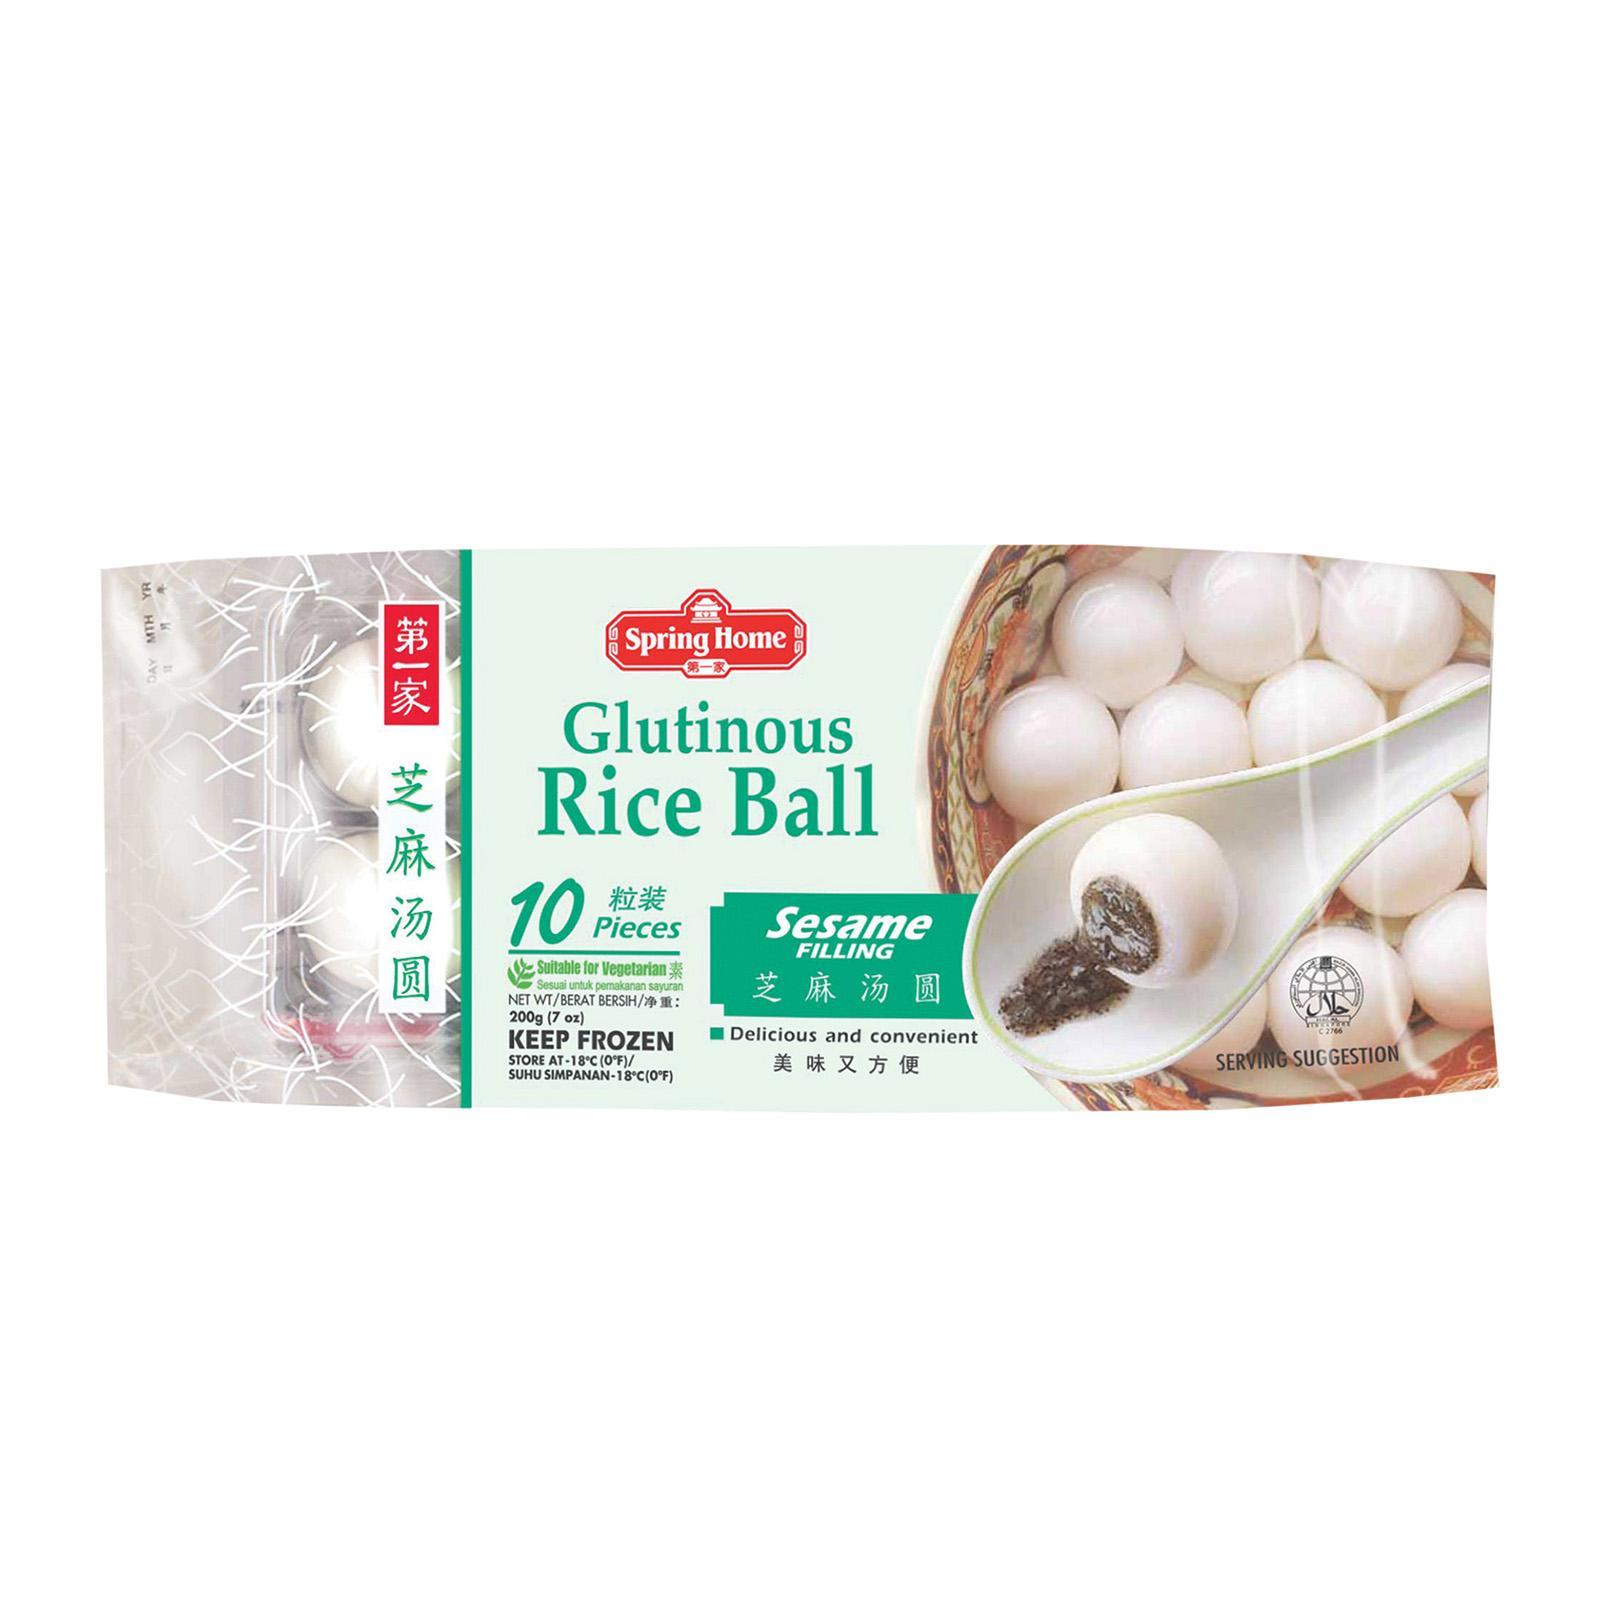 Spring Home Glutinous Rice Ball - Sesame (10 Pcs) - Frozen By Redmart.